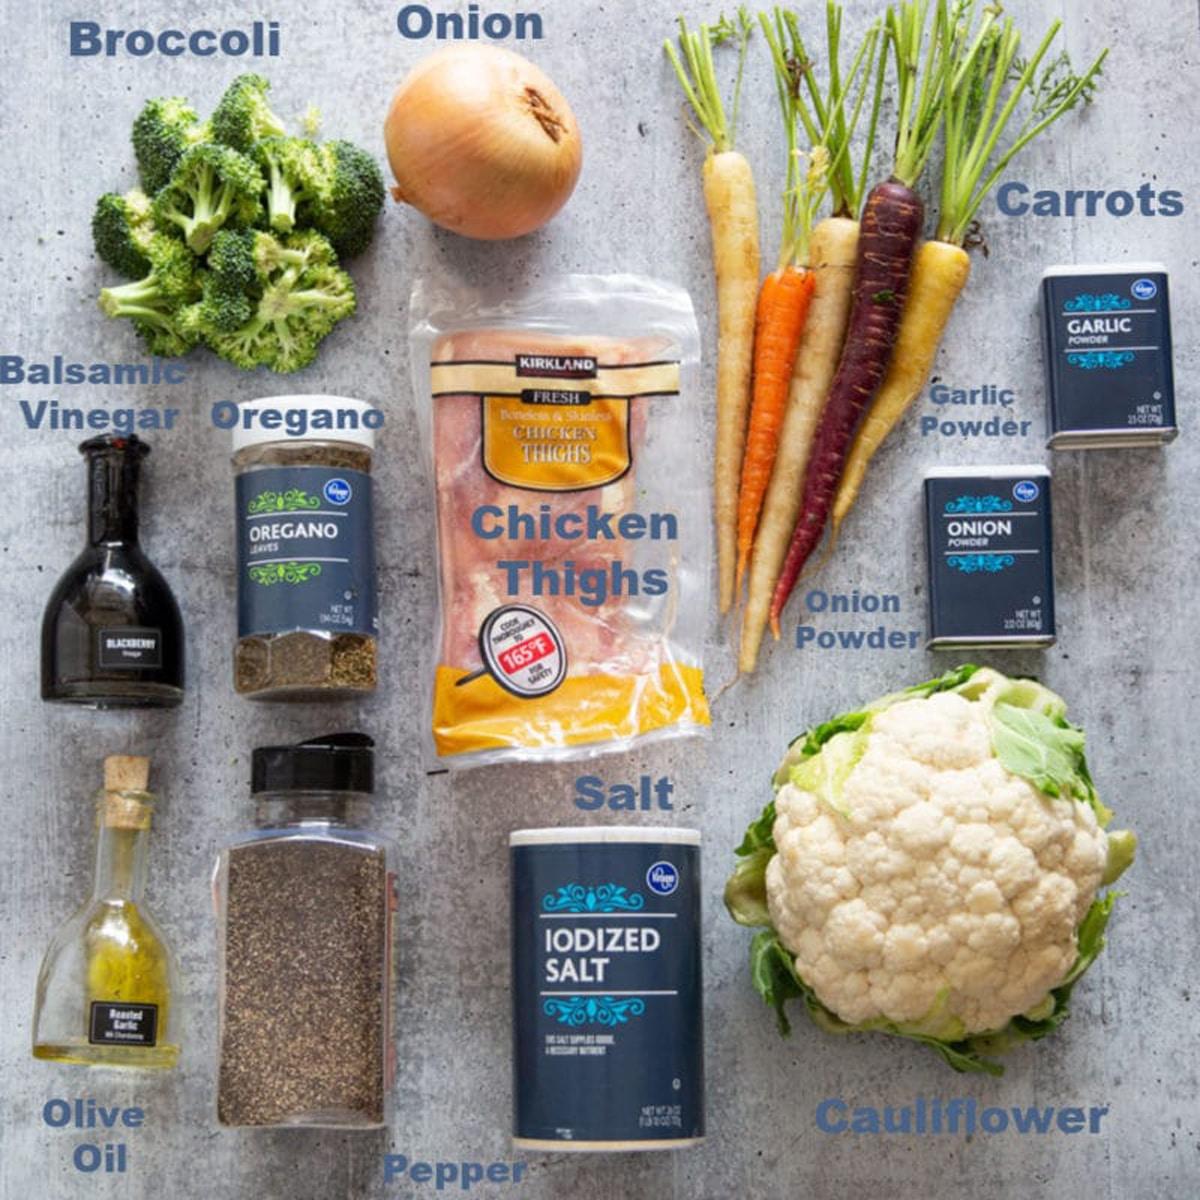 Broccoli, chicken thighs, onion, carrots, cauliflower, olive oil, balsamic vinegar, seasoning on counter.